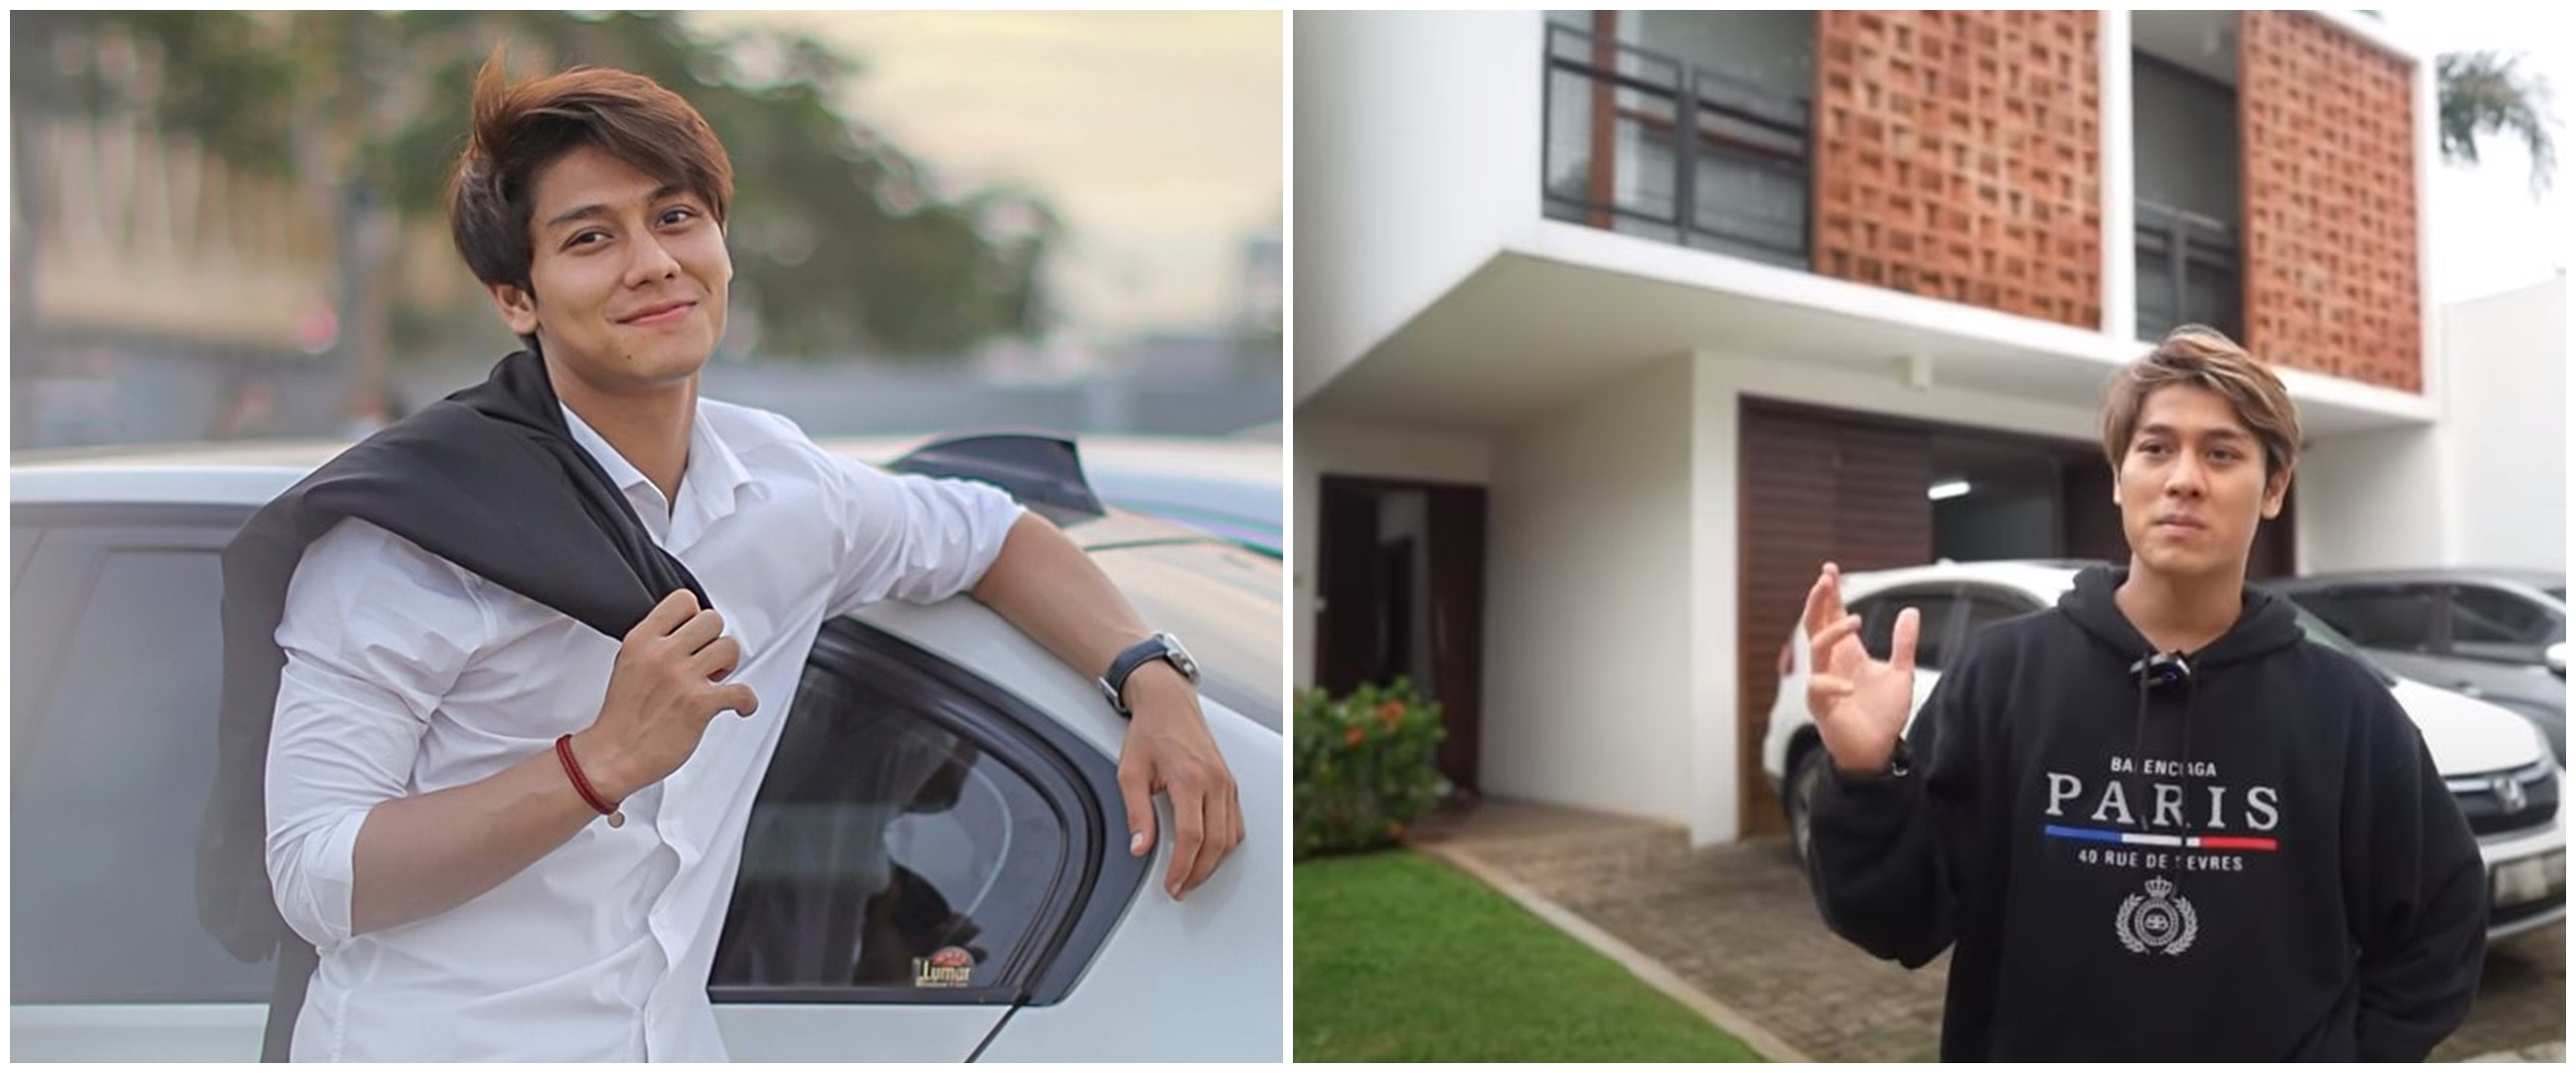 15 Potret rumah baru Rizky Billar, foto sama Lesty Kejora disorot